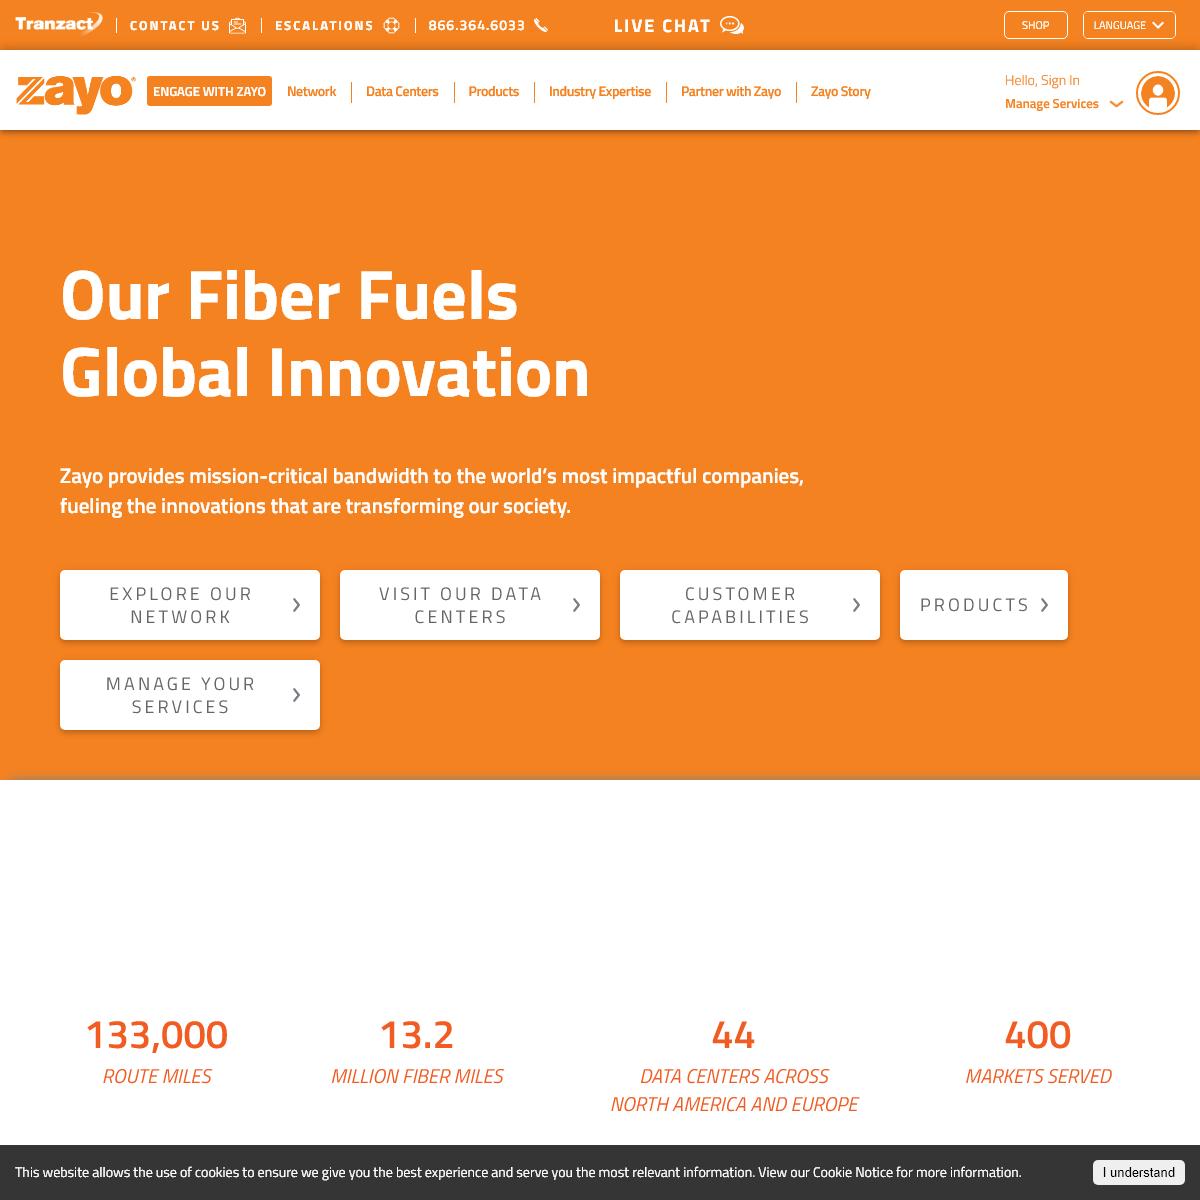 Our Fiber Fuels Global Innovation - Home - Zayo